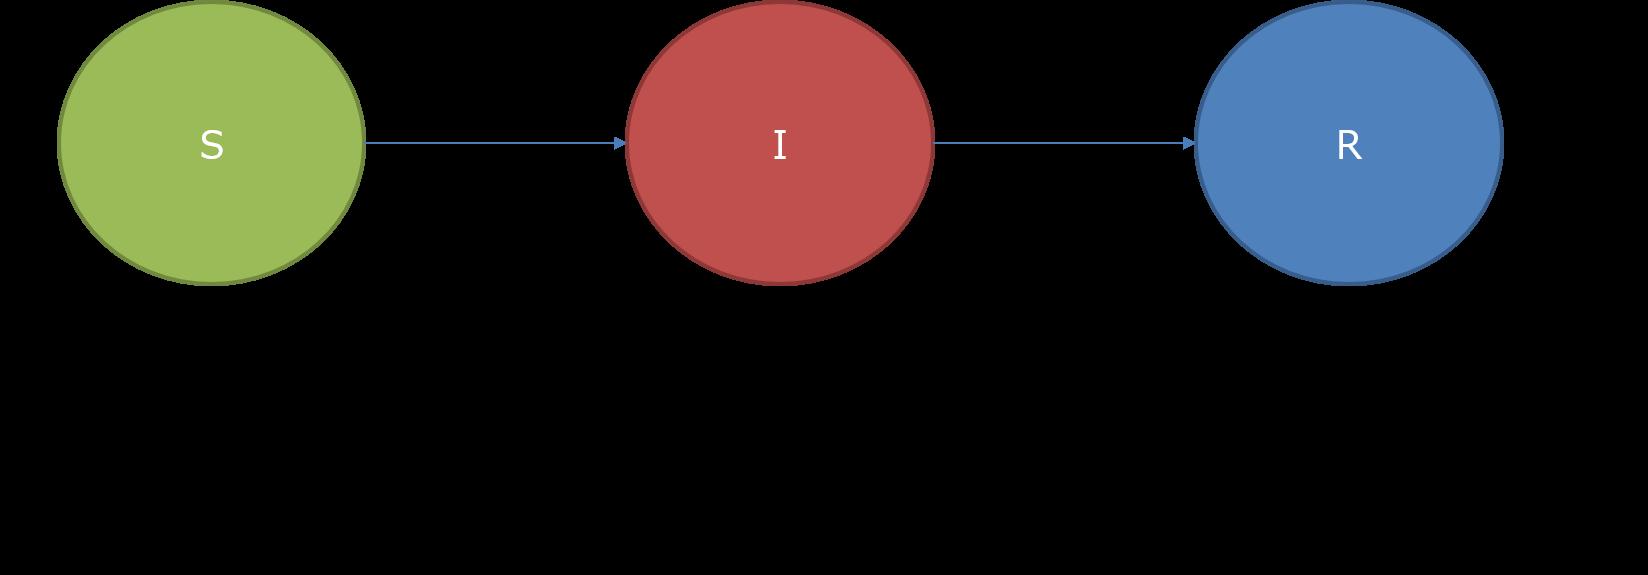 Figure01.png